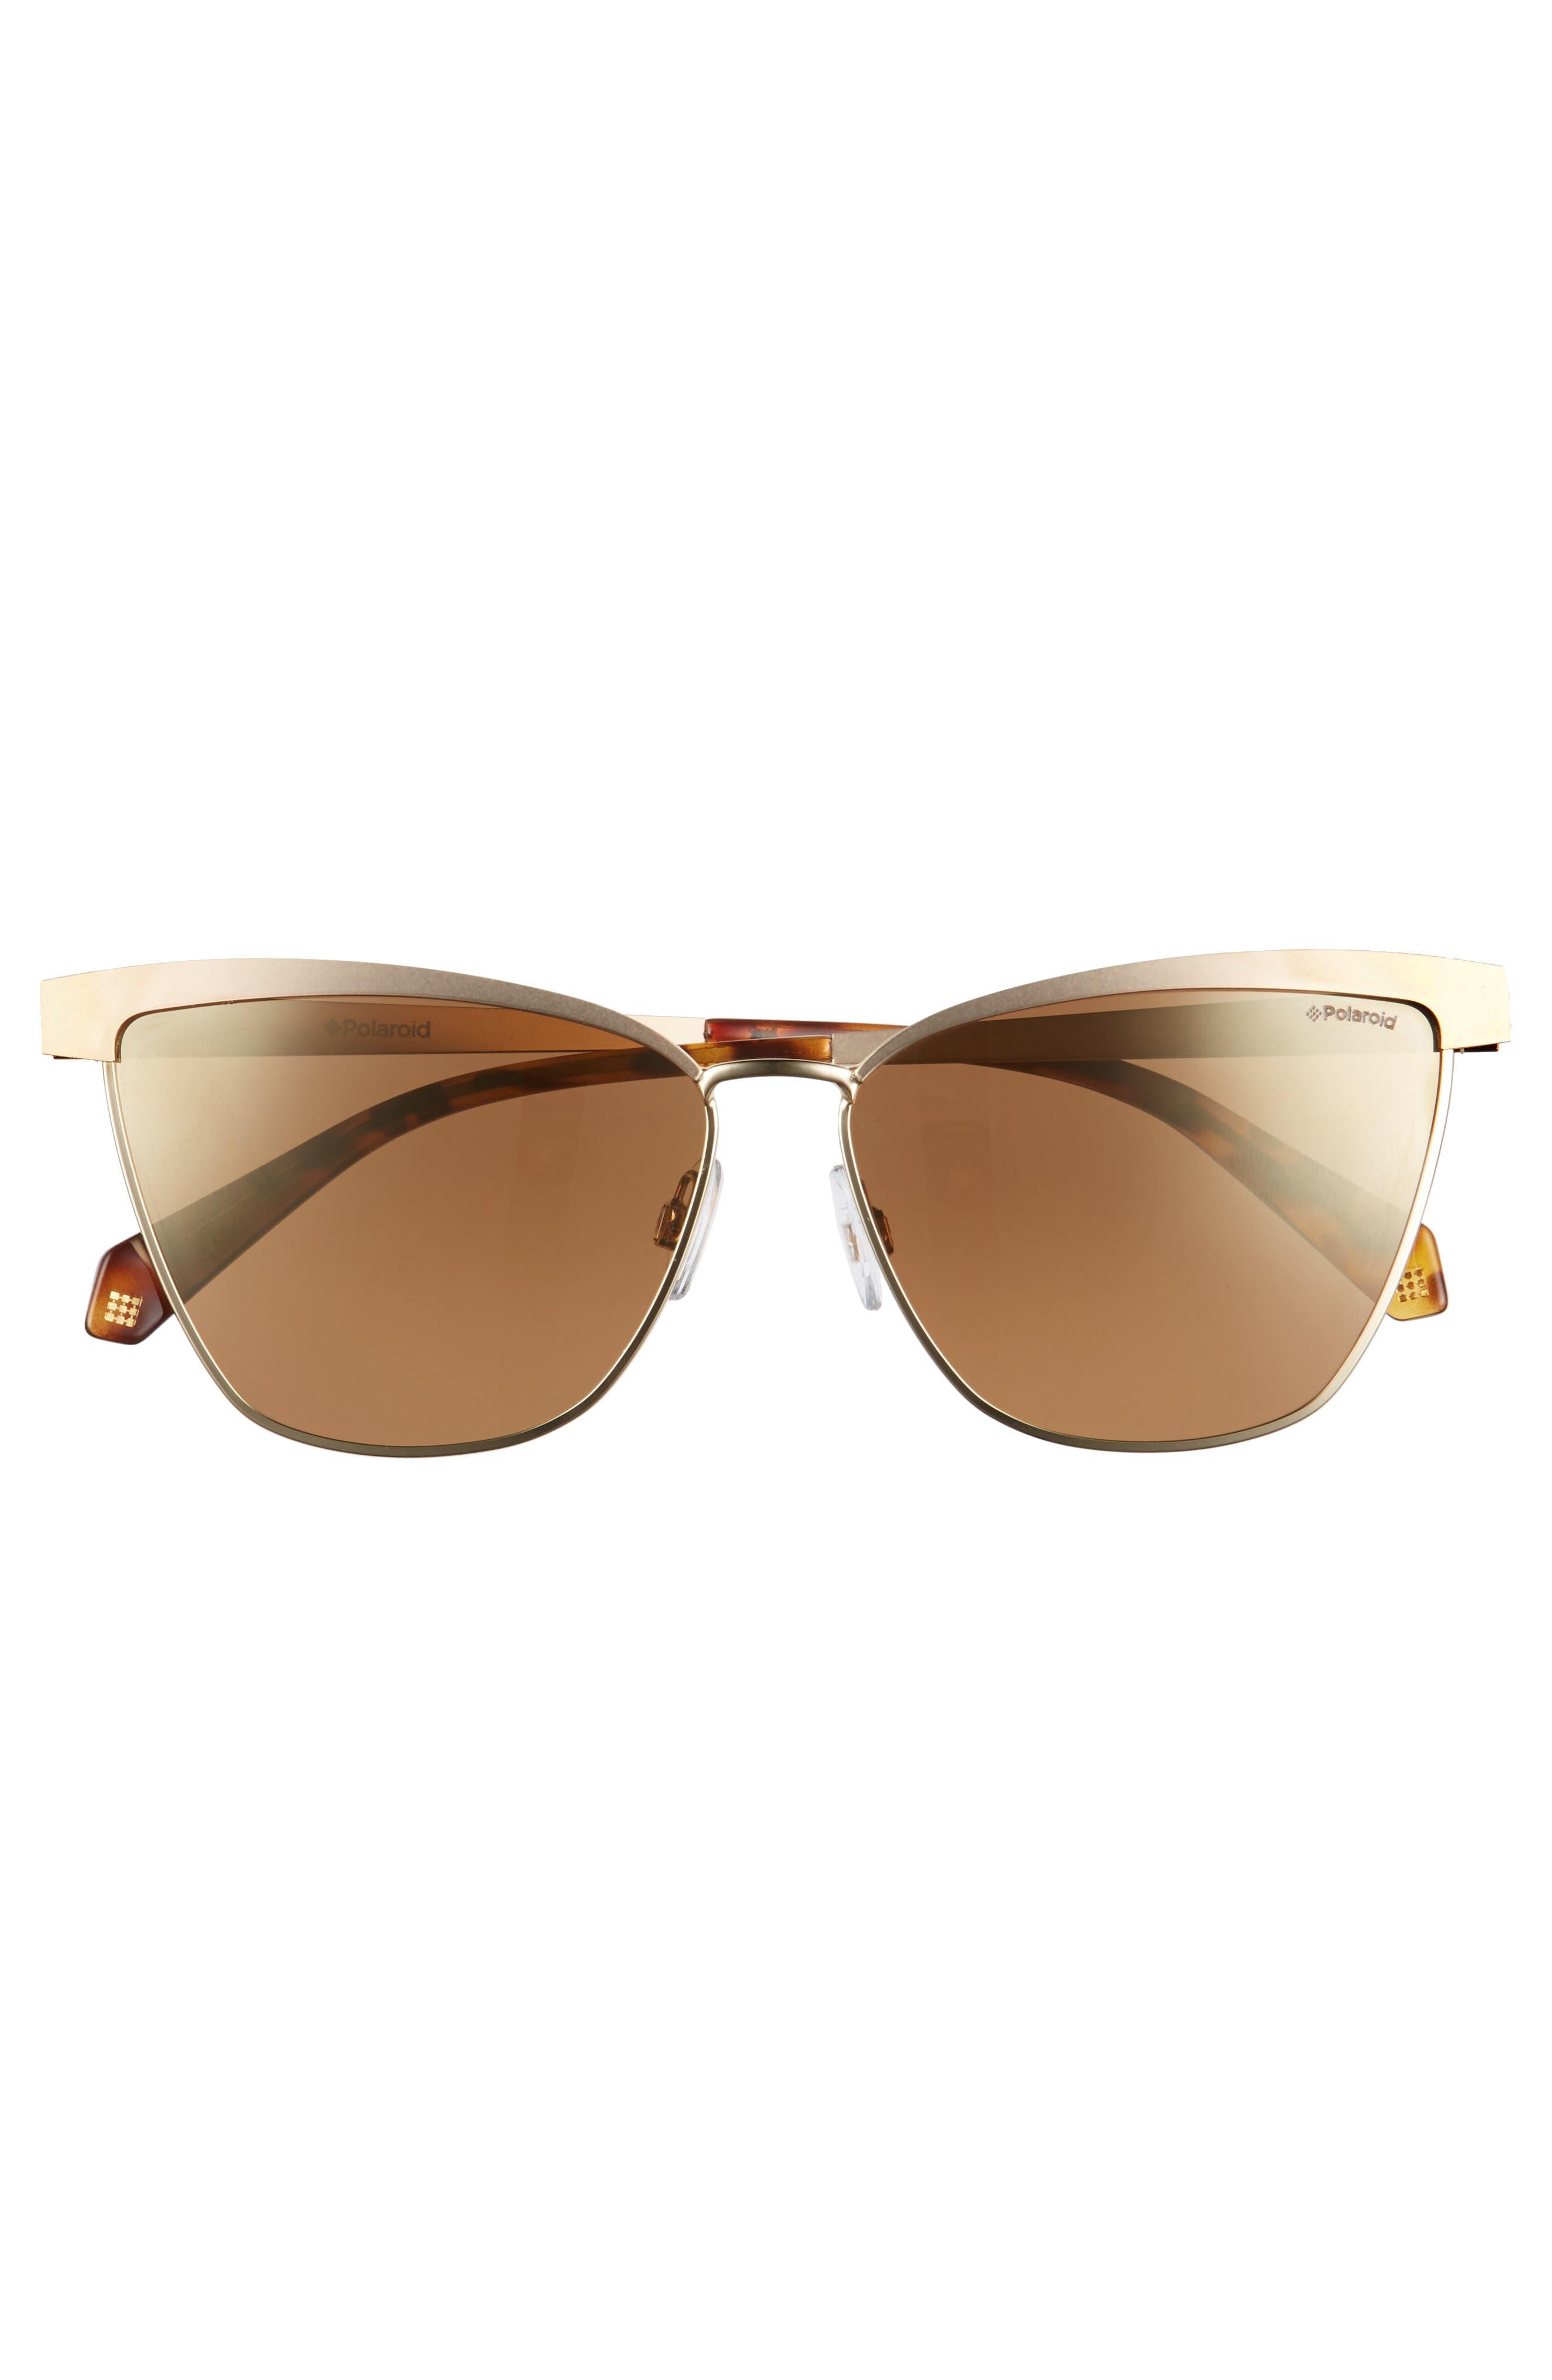 60mm Polarized Cat Eye Sunglasses,                             Alternate thumbnail 6, color,